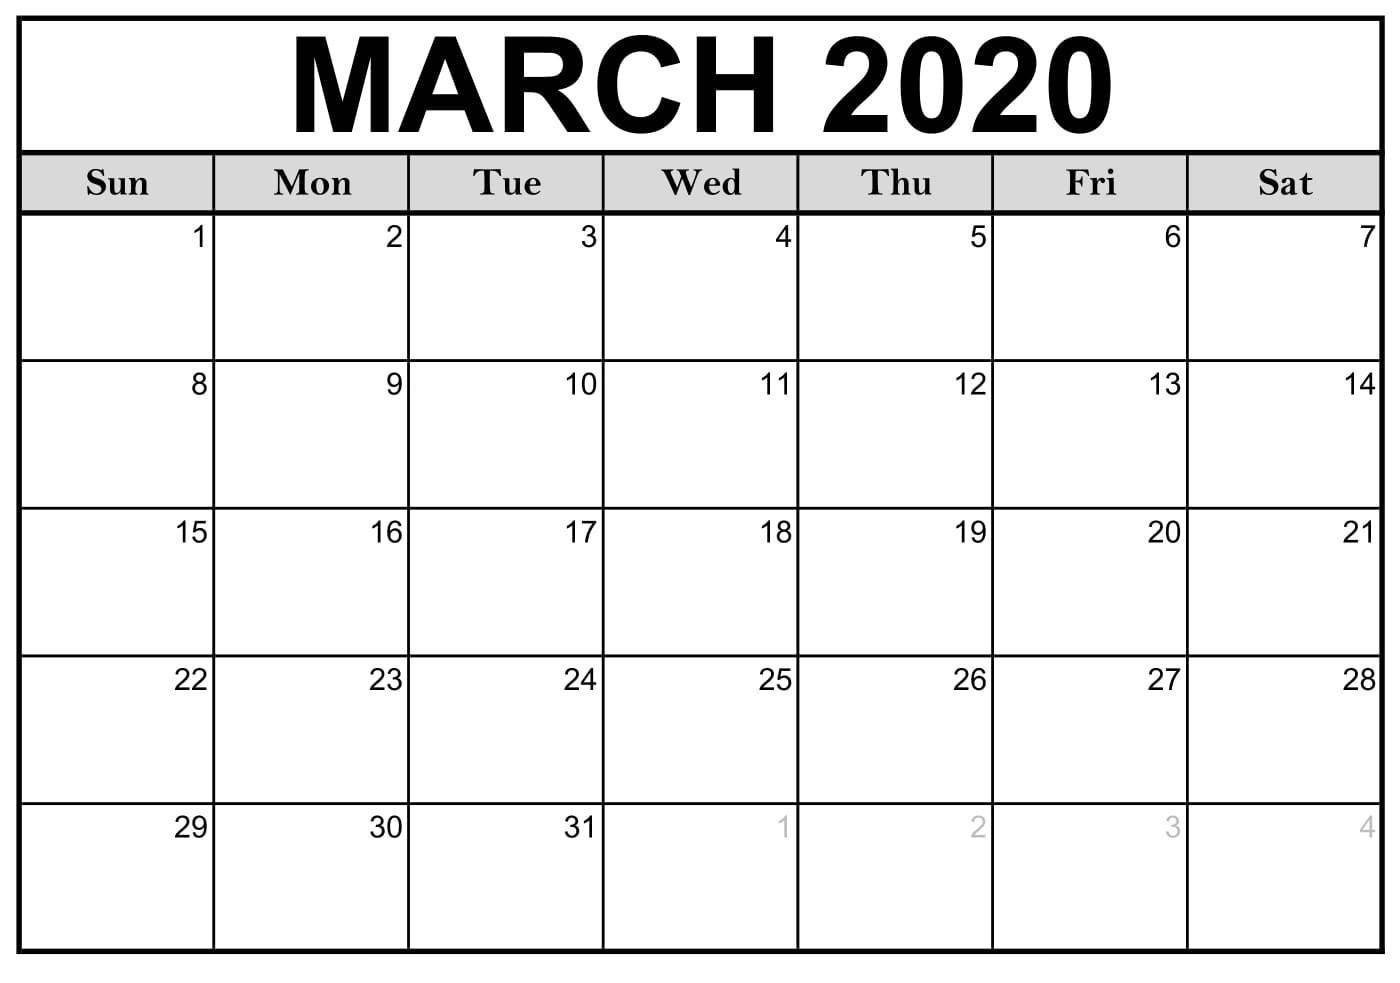 Fillable March 2020 Calendar Template Word, Pdf, Excel  2020 Calendar Printable Free